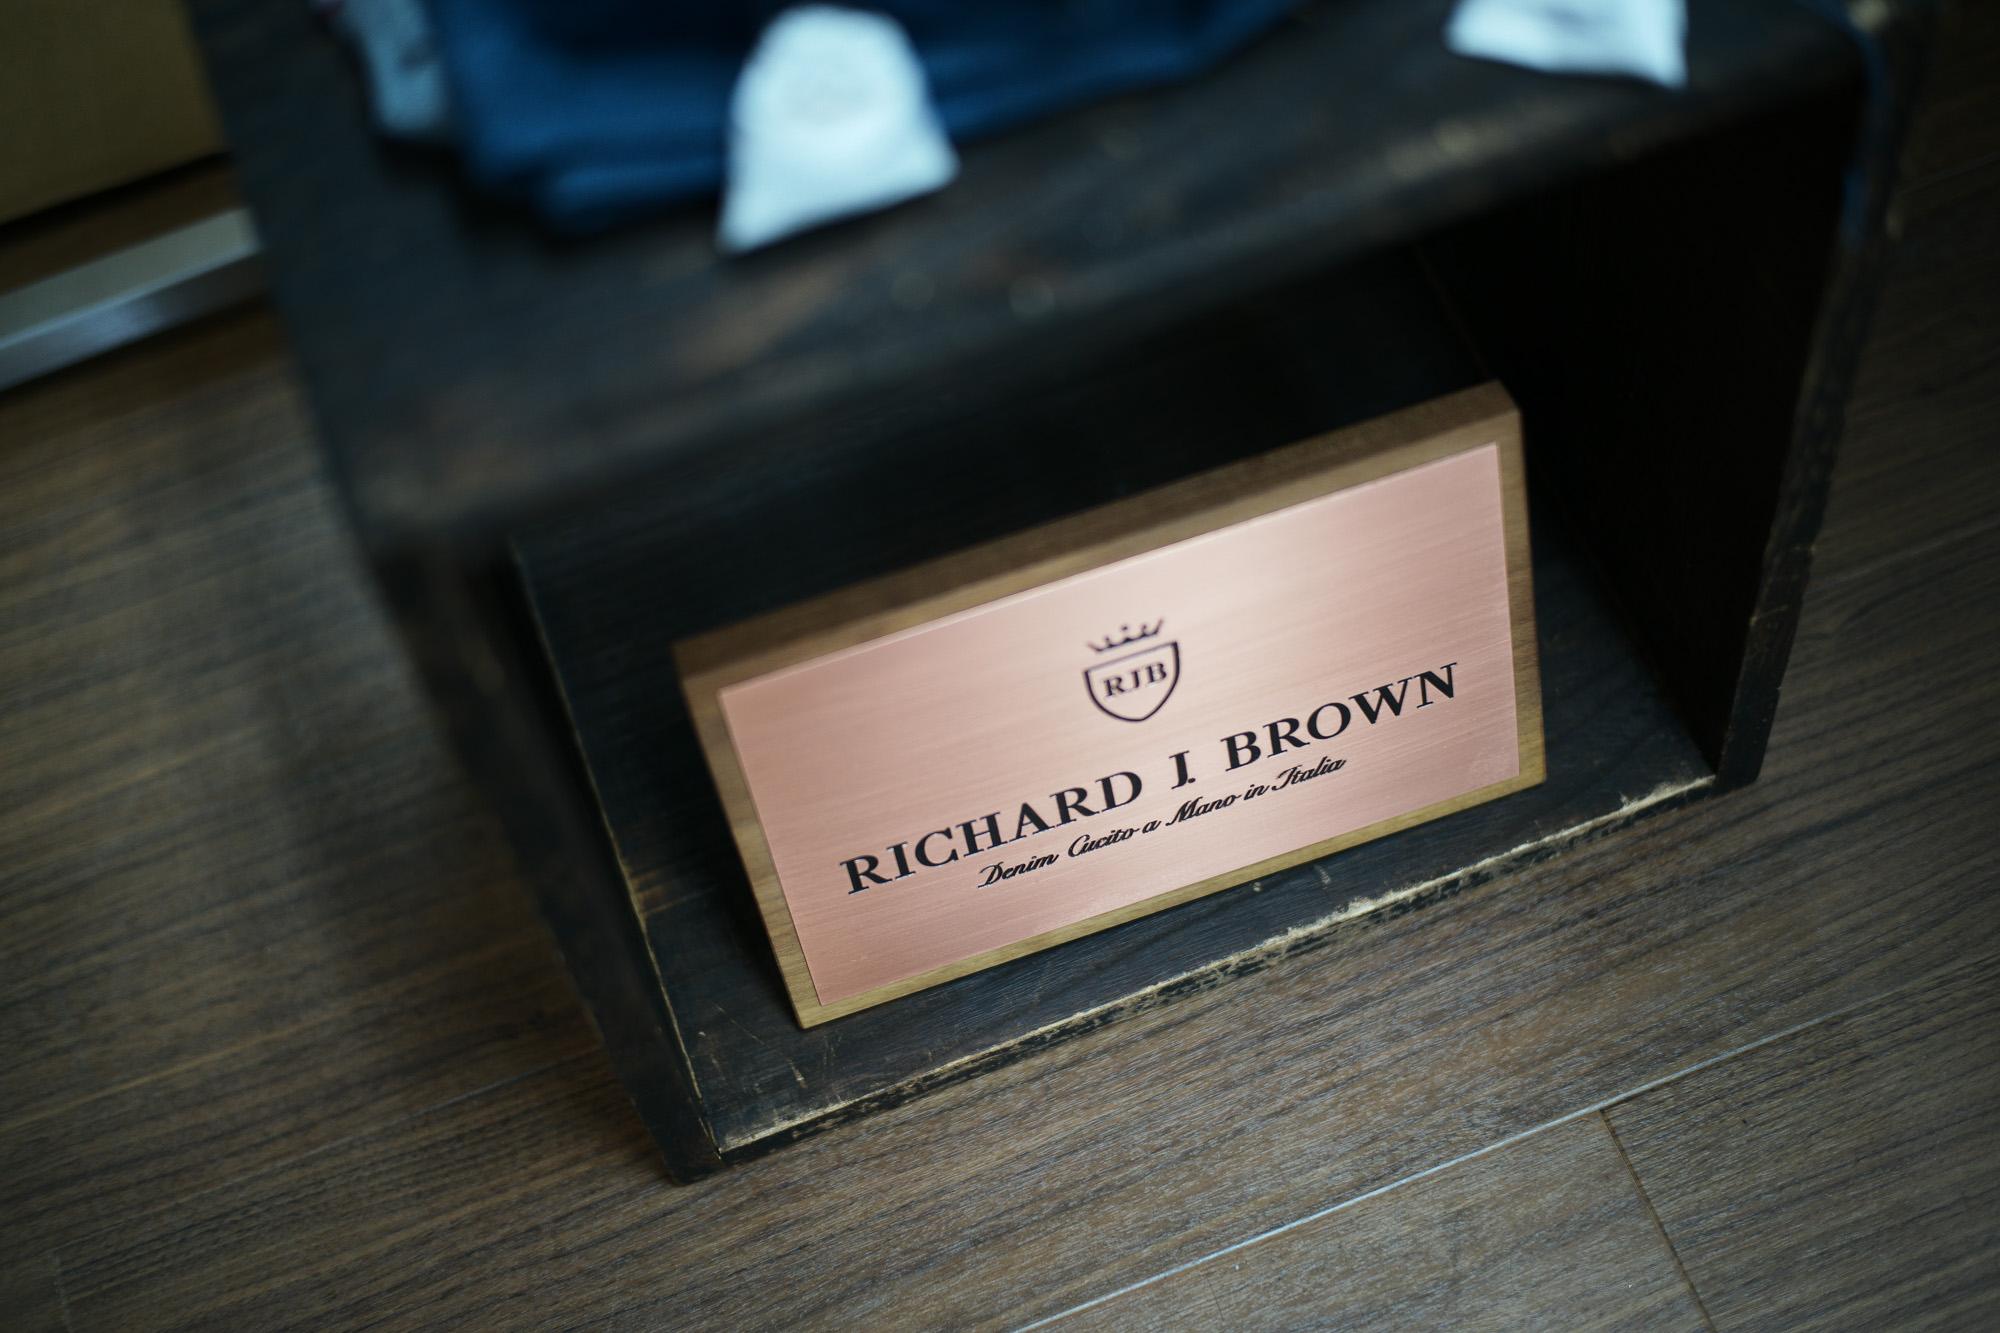 RICHARD J.BROWN / リチャードジェイブラウン (2018 秋冬 プレ 展示会) RICHARDJBROWN リチャードジェイブラウン デニムパンツ DENIM 2018年春夏 展示会。愛知 名古屋 Alto e Diritto アルト エ デリット  ジーンズ